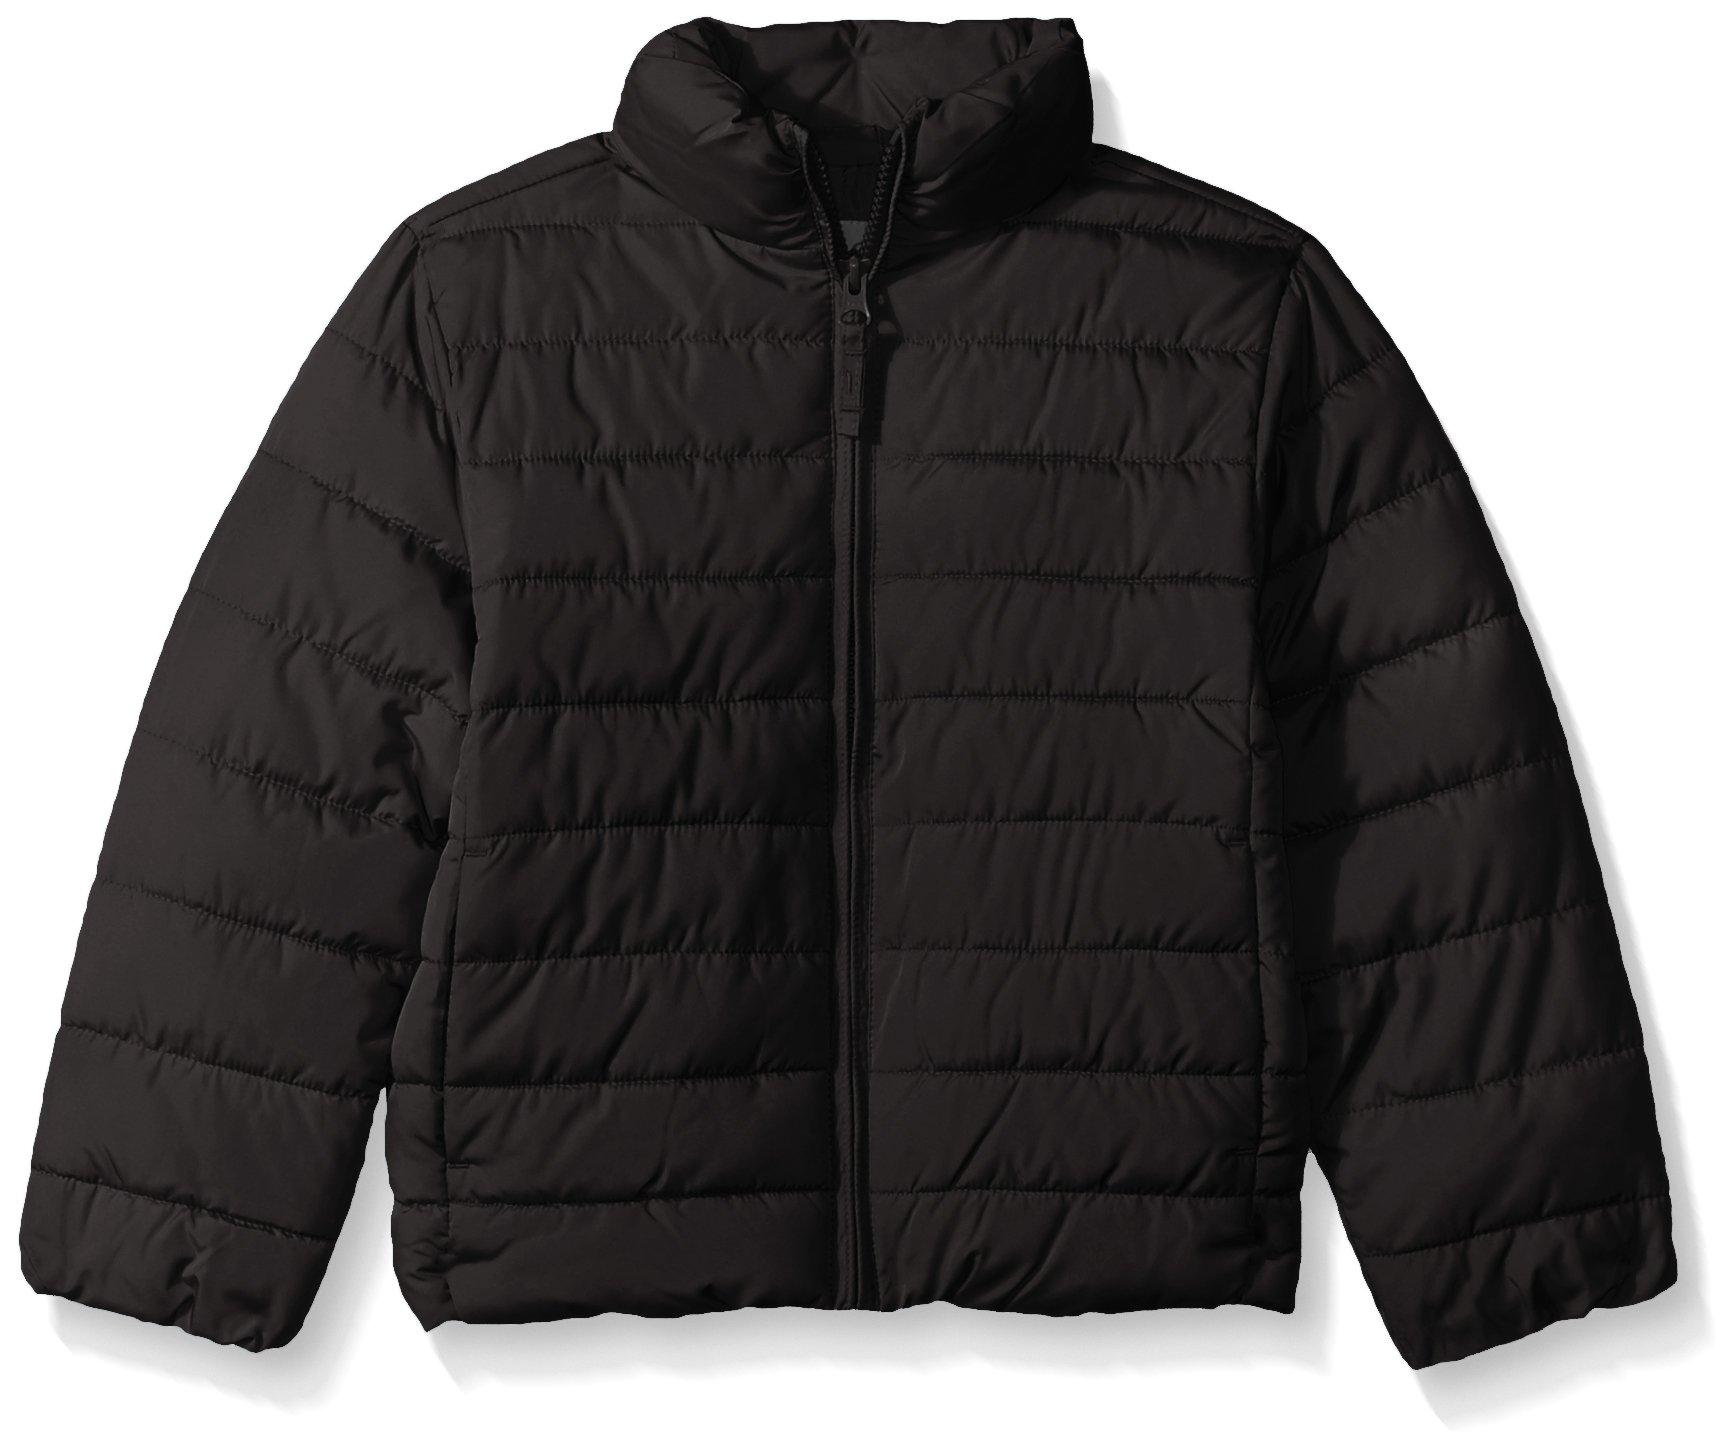 The Children's Place Little Girls' Her Puffer Jacket, Black, S (5/6)